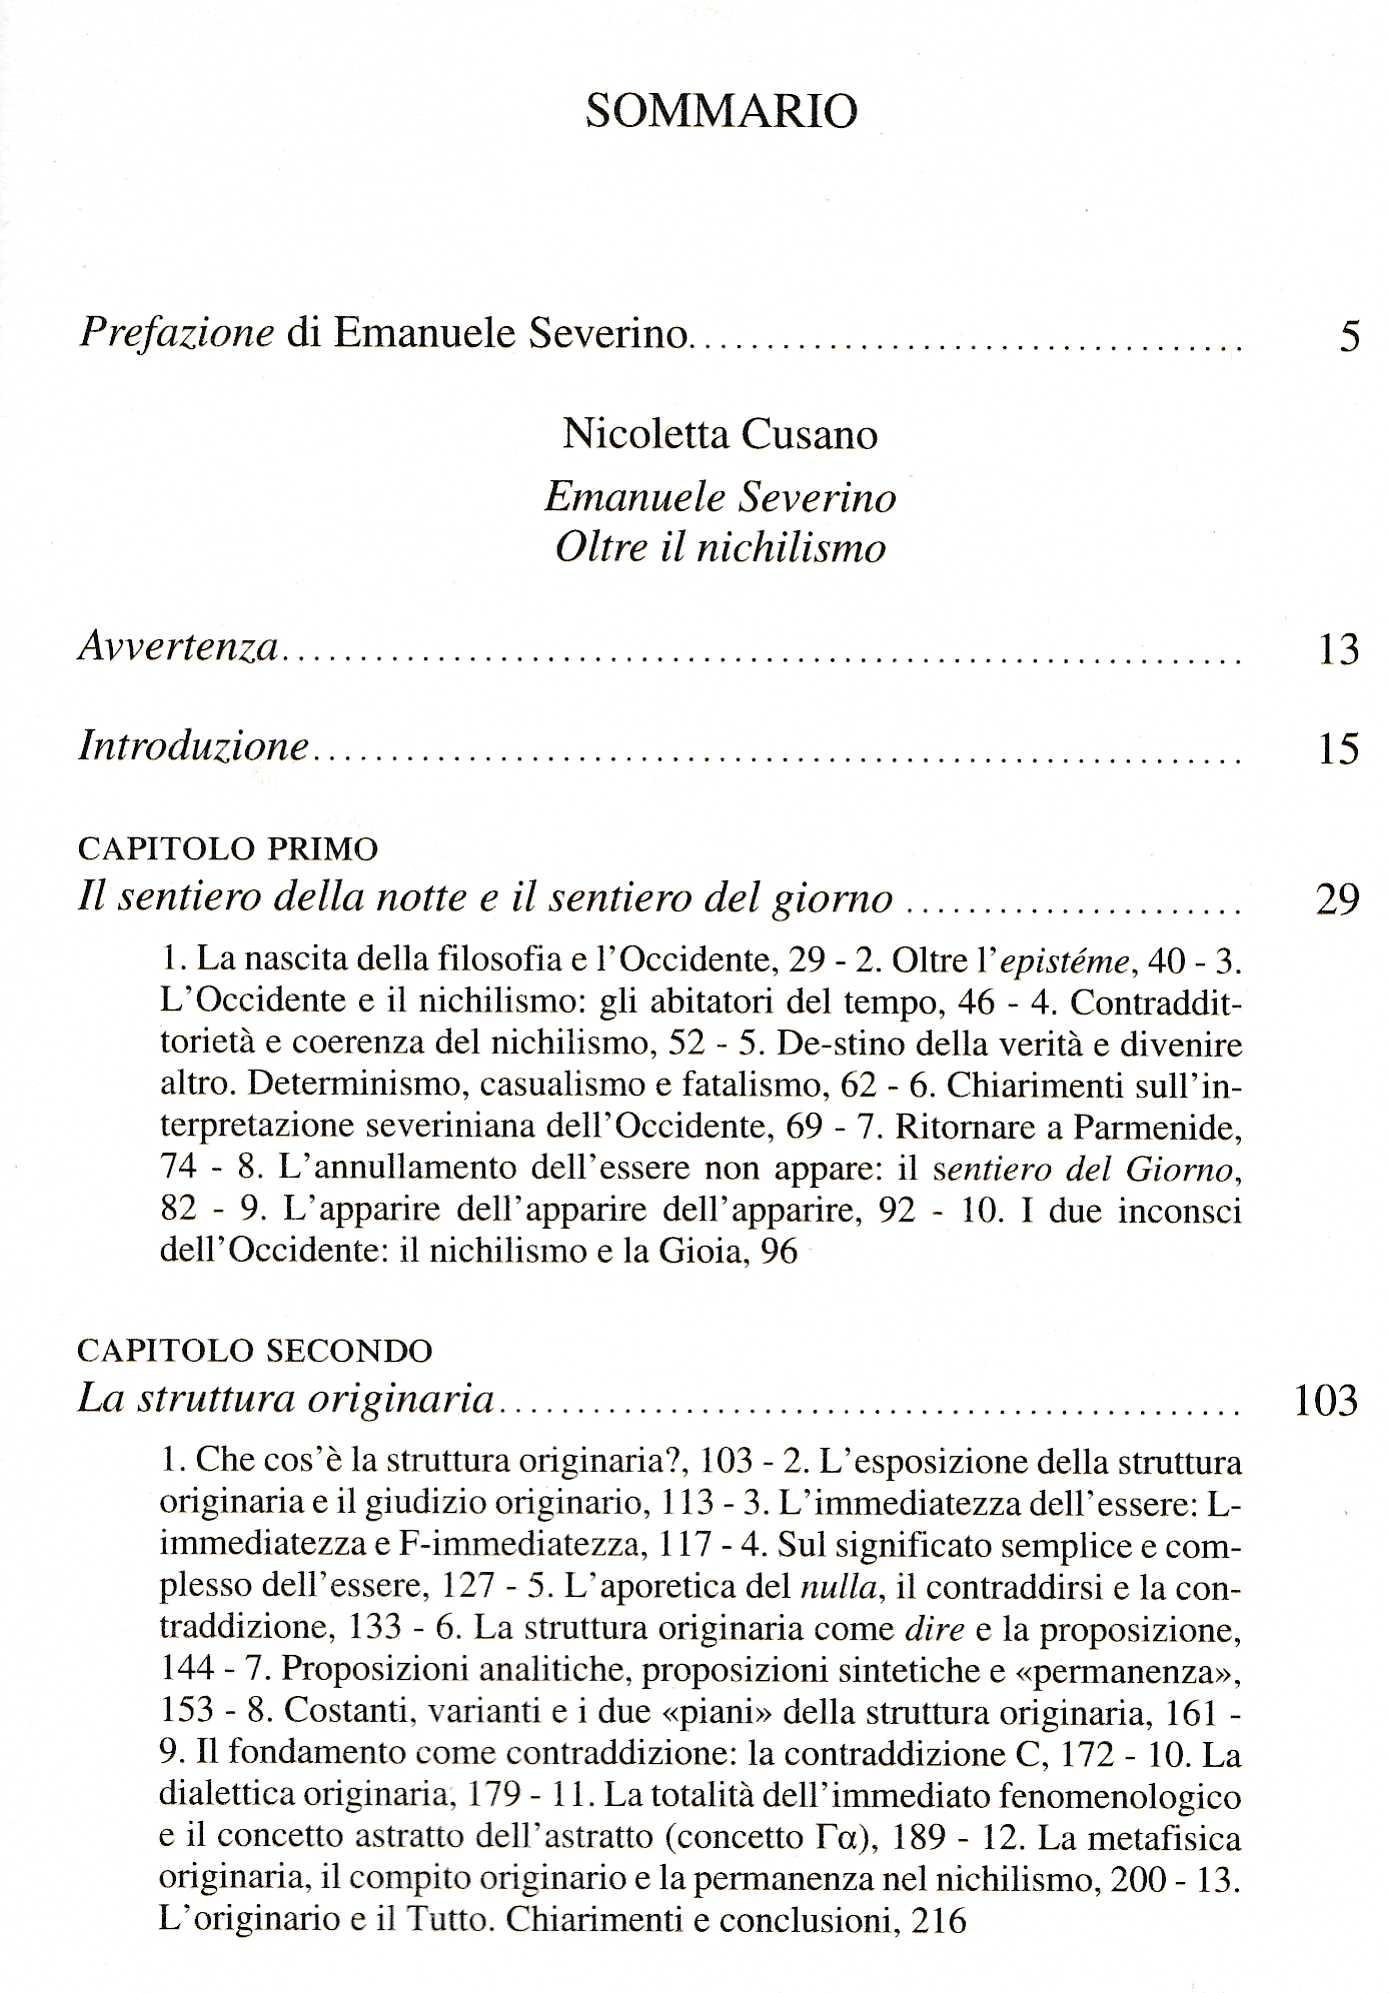 cusano-emanueleseverino-morcelliana5138